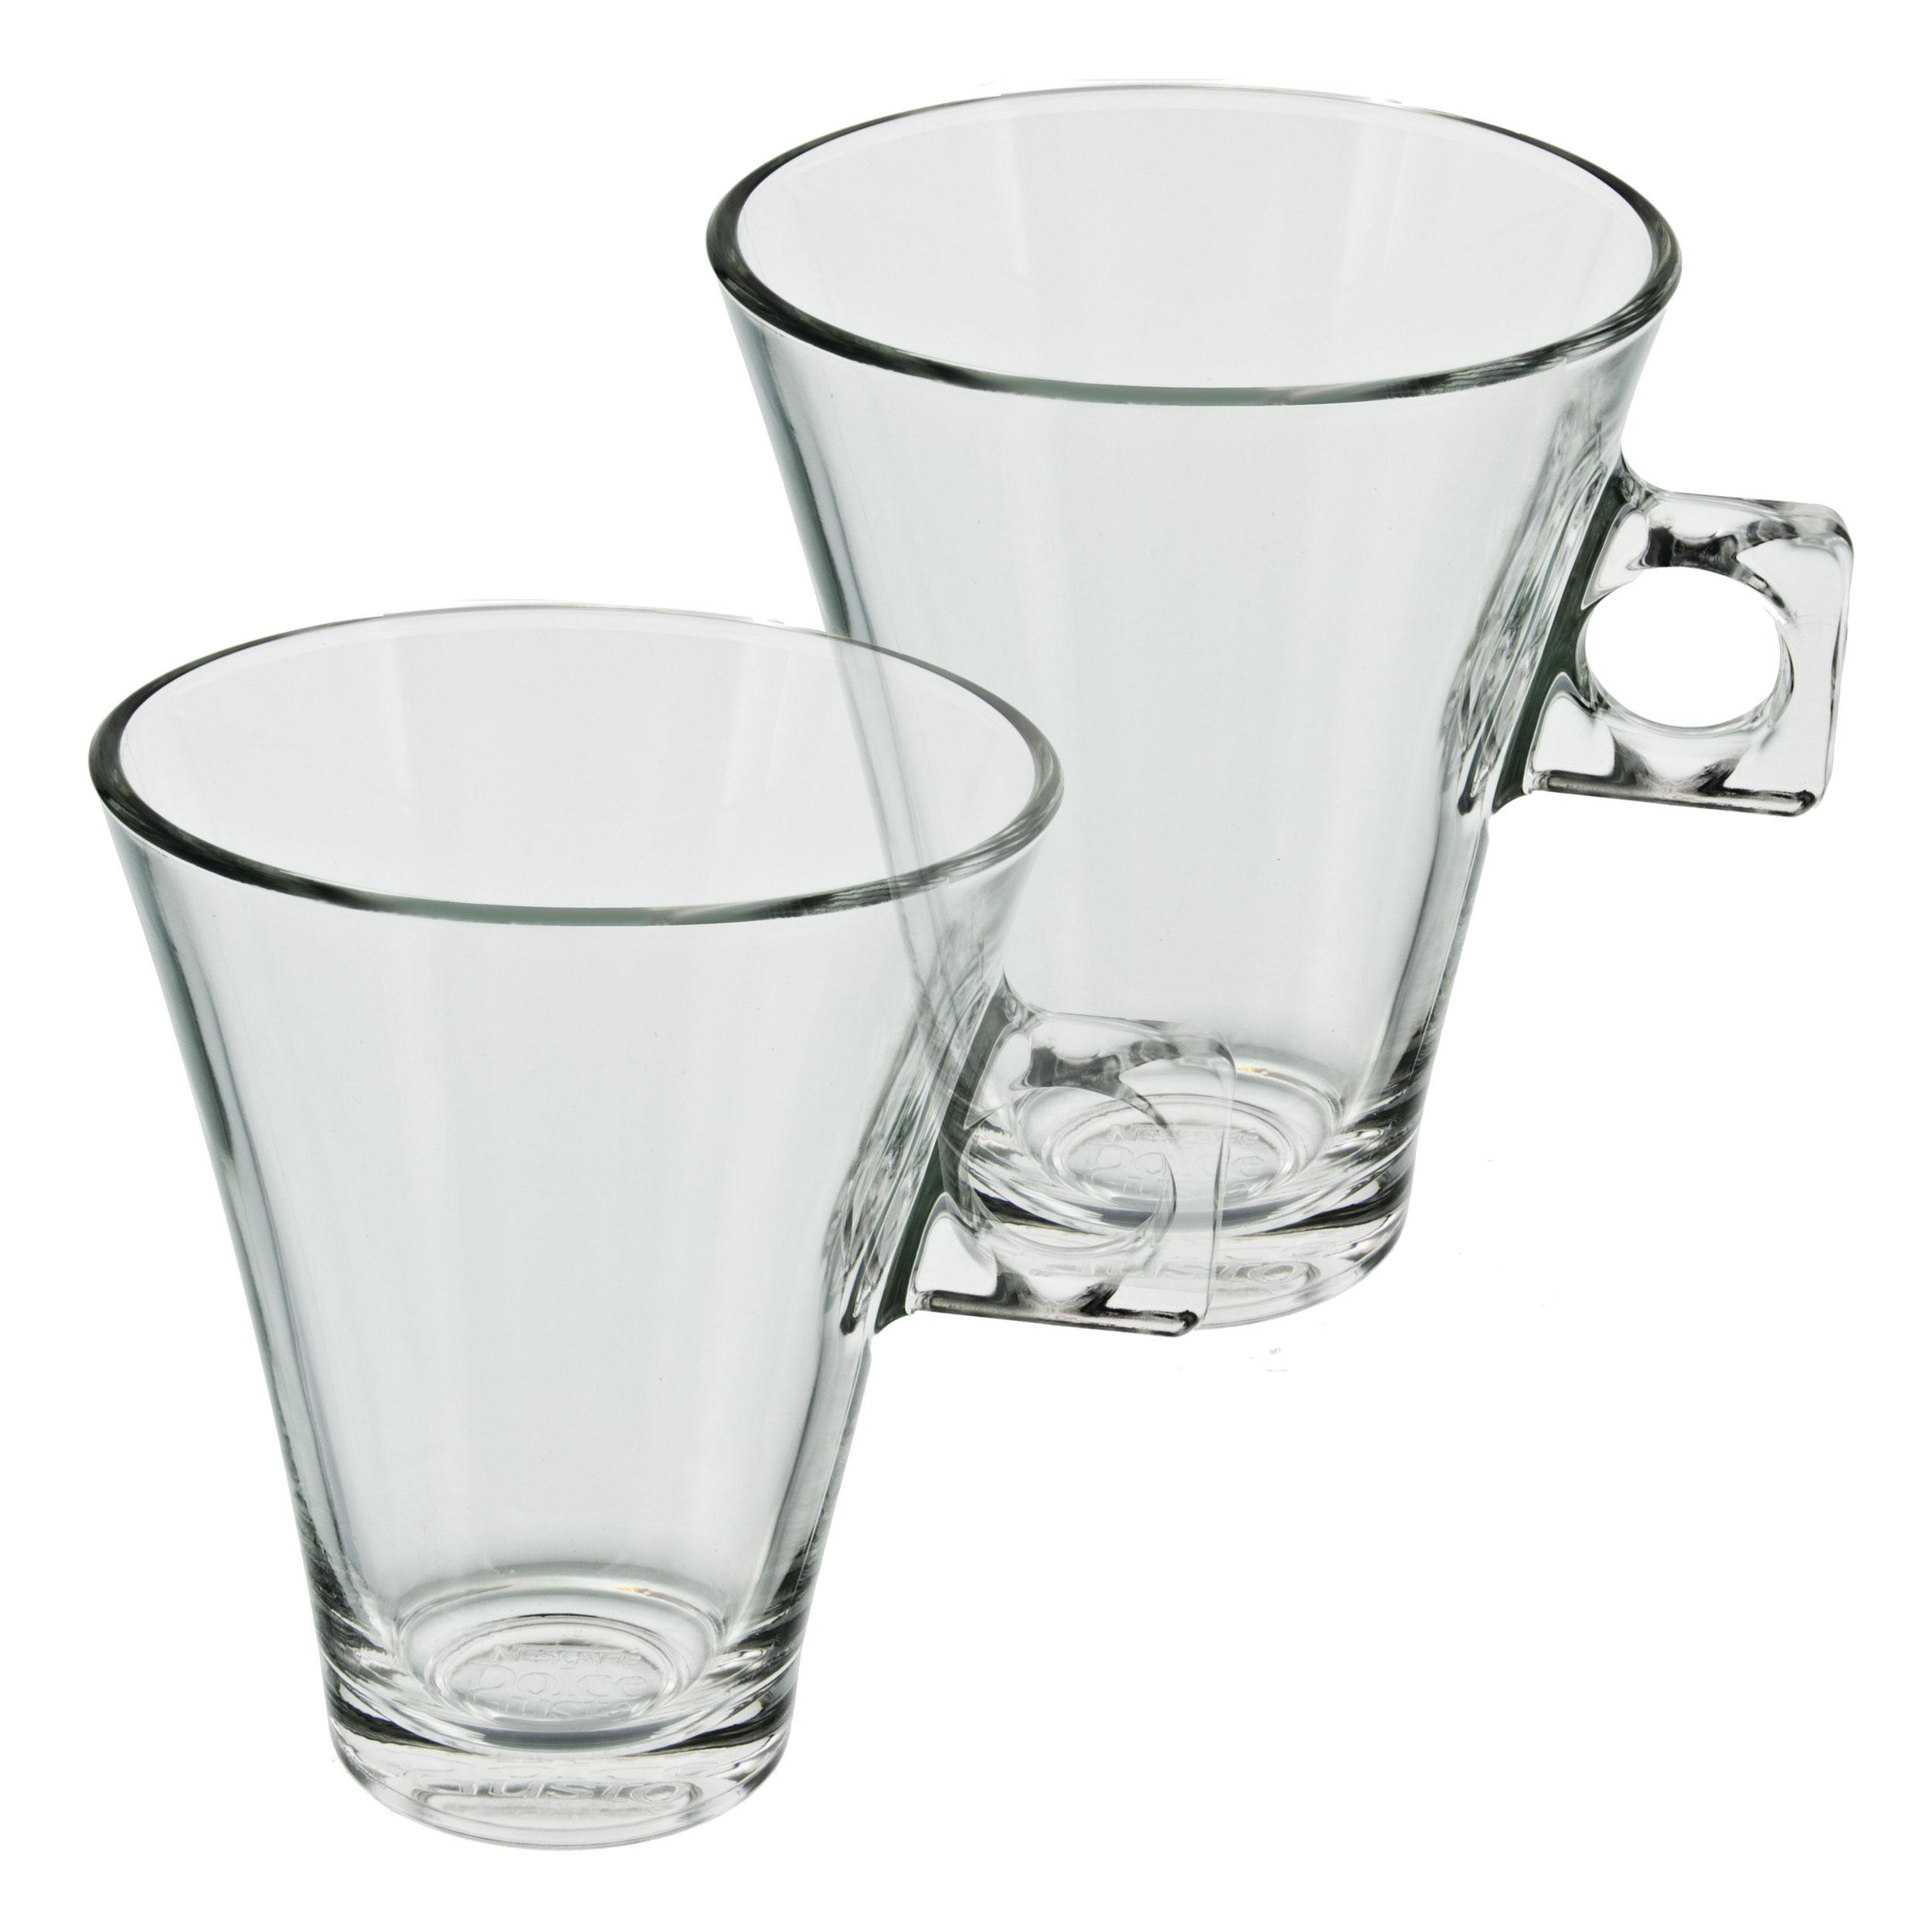 Nescafé DOLCE GUSTO Latte Macchiato Design Glas Becher 200 ml Tasse 2er Set